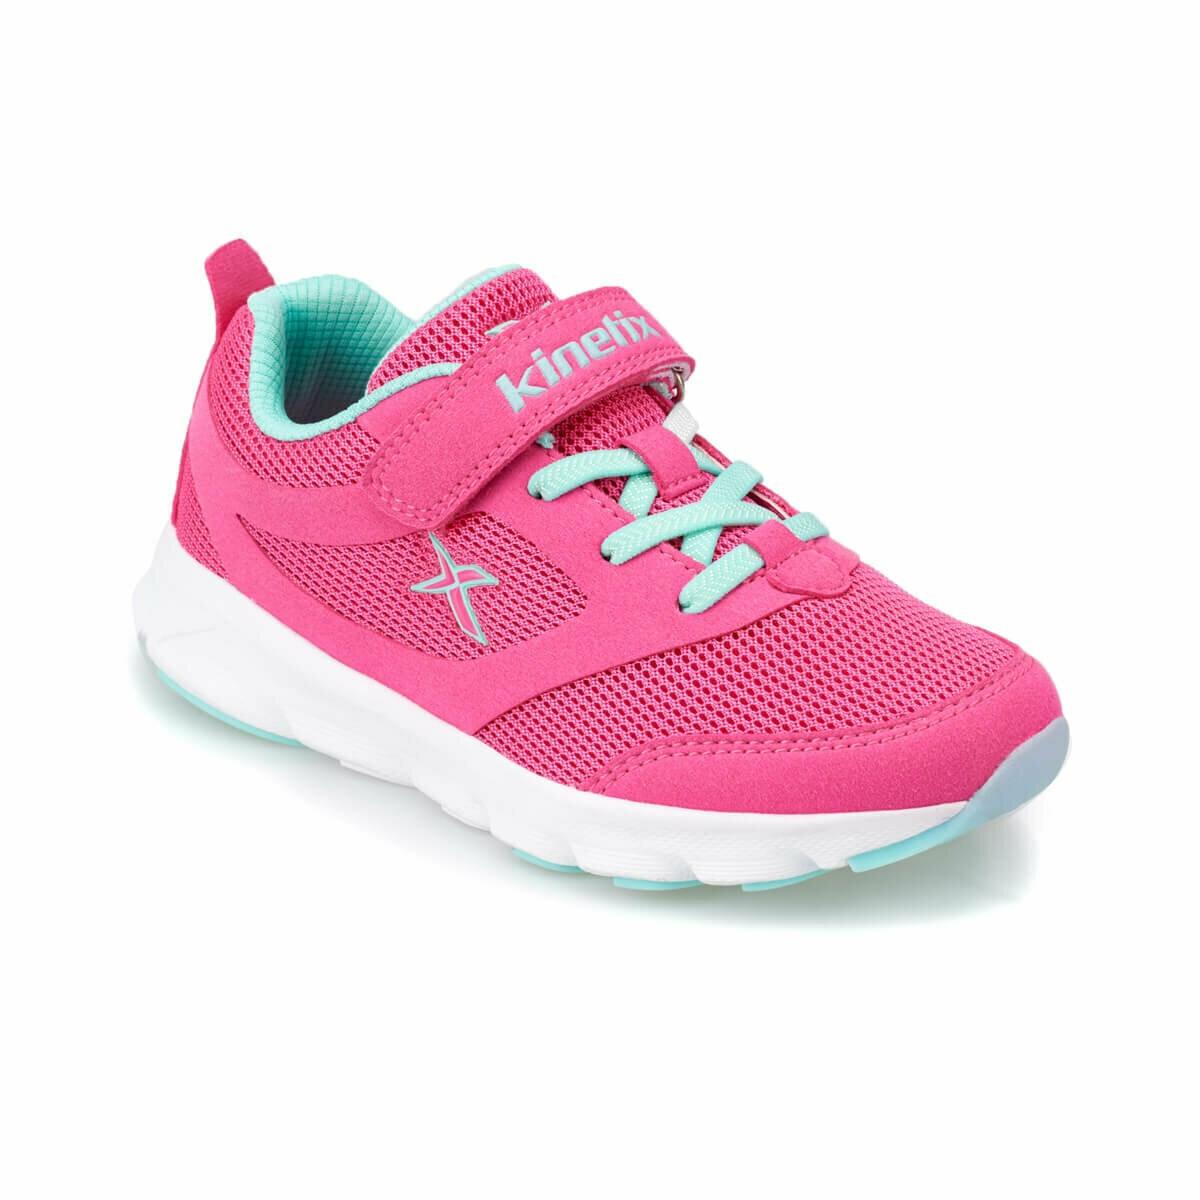 FLO ALMERA J Fuchsia Female Child Running Shoes KINETIX